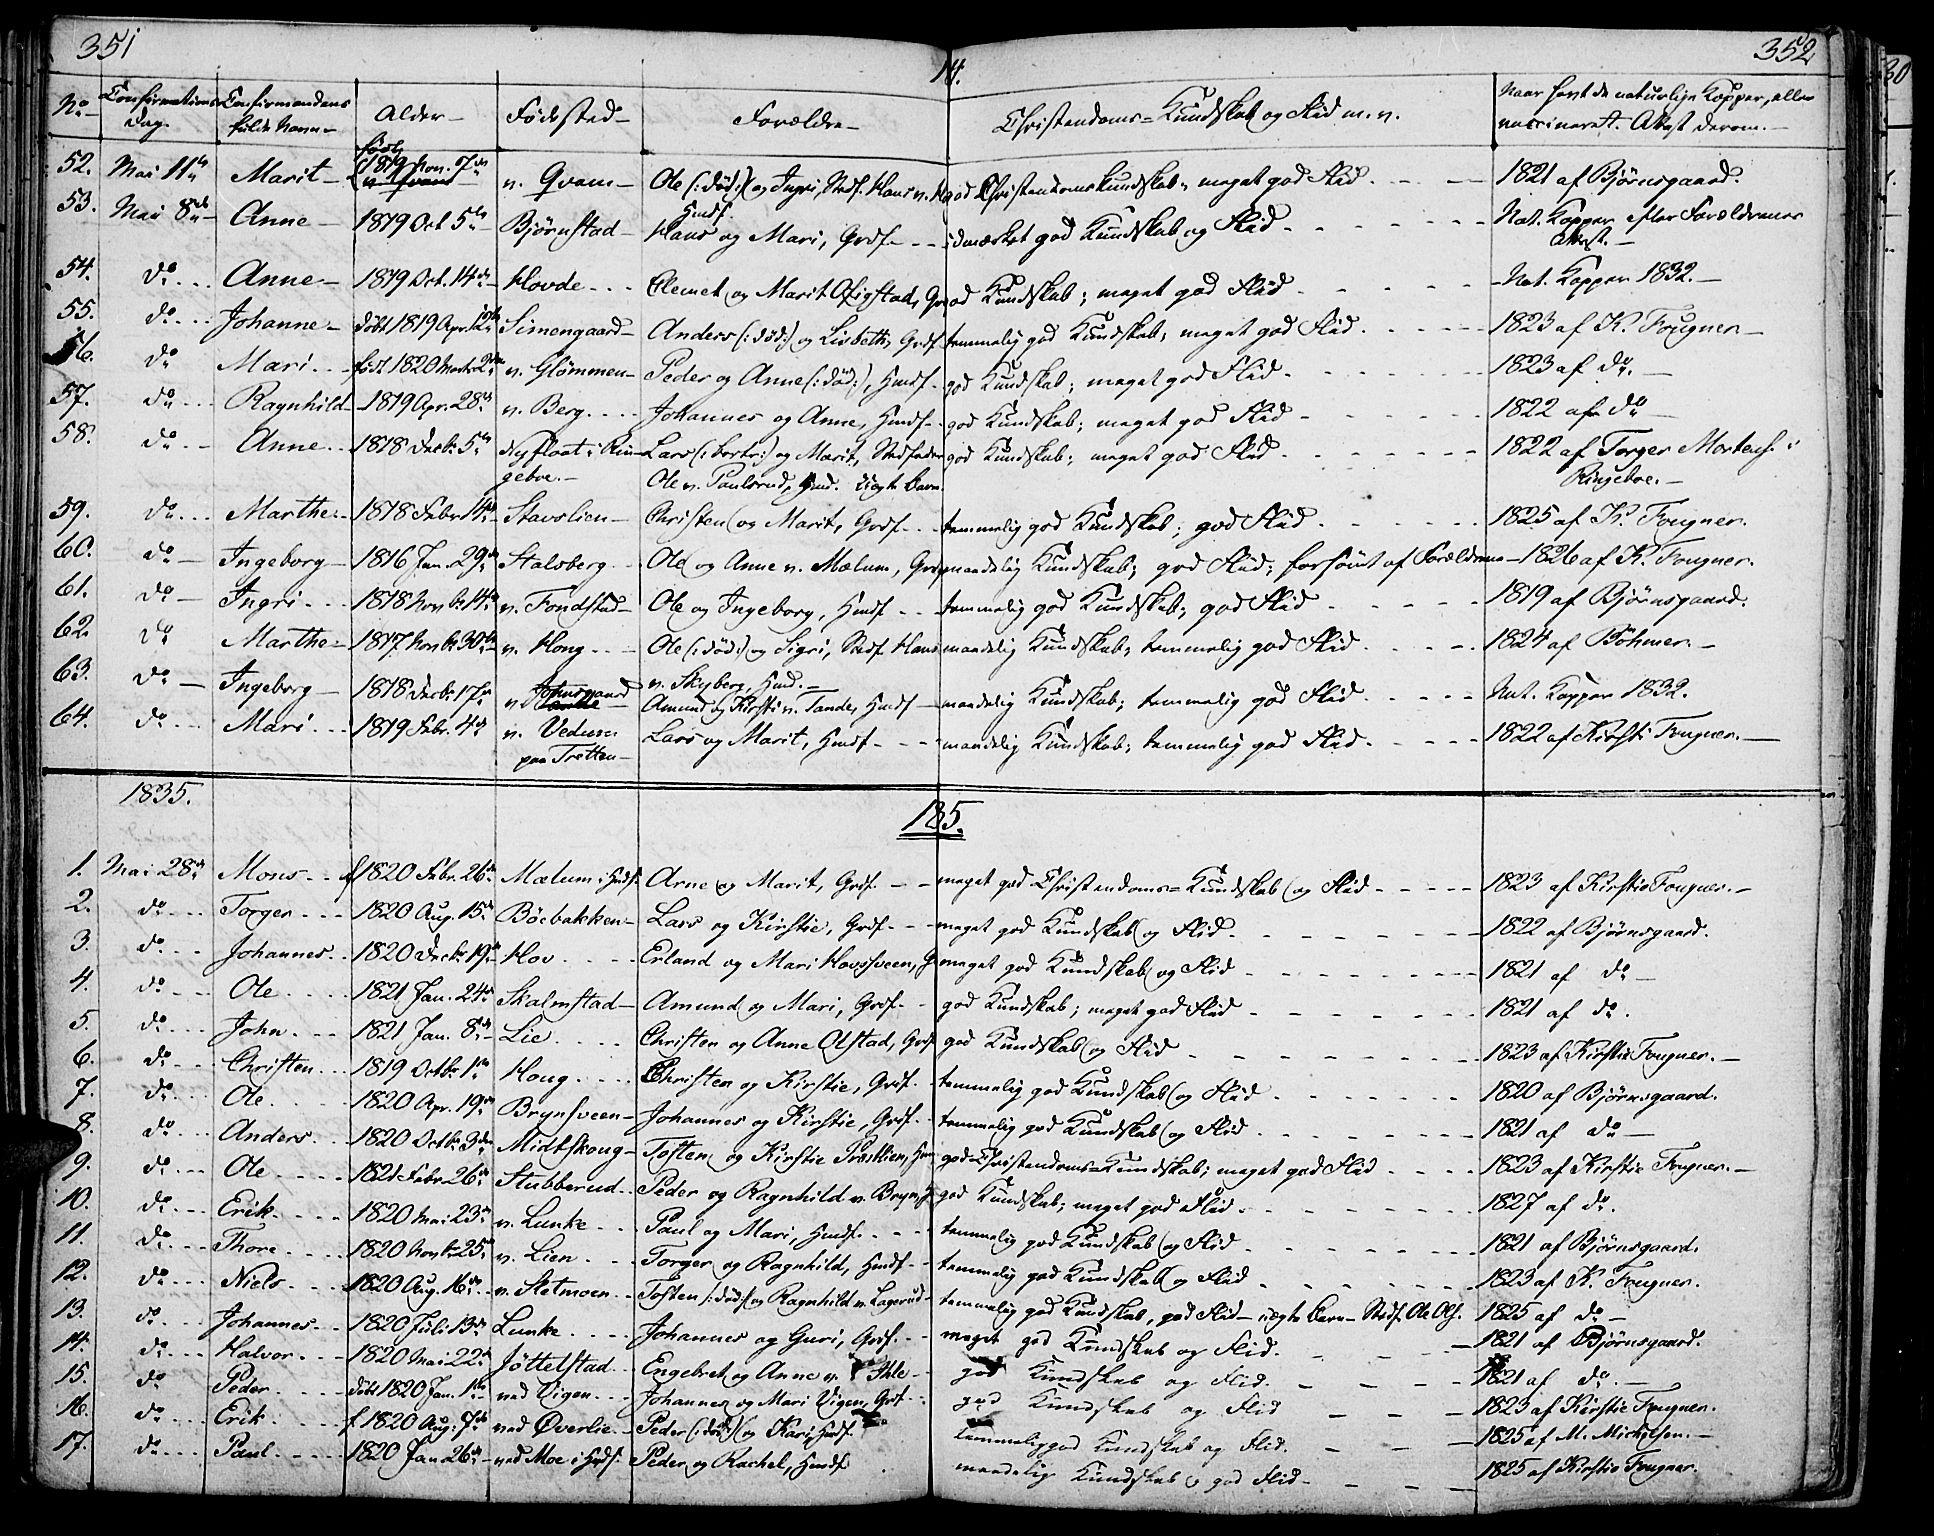 SAH, Øyer prestekontor, Ministerialbok nr. 4, 1824-1841, s. 351-352